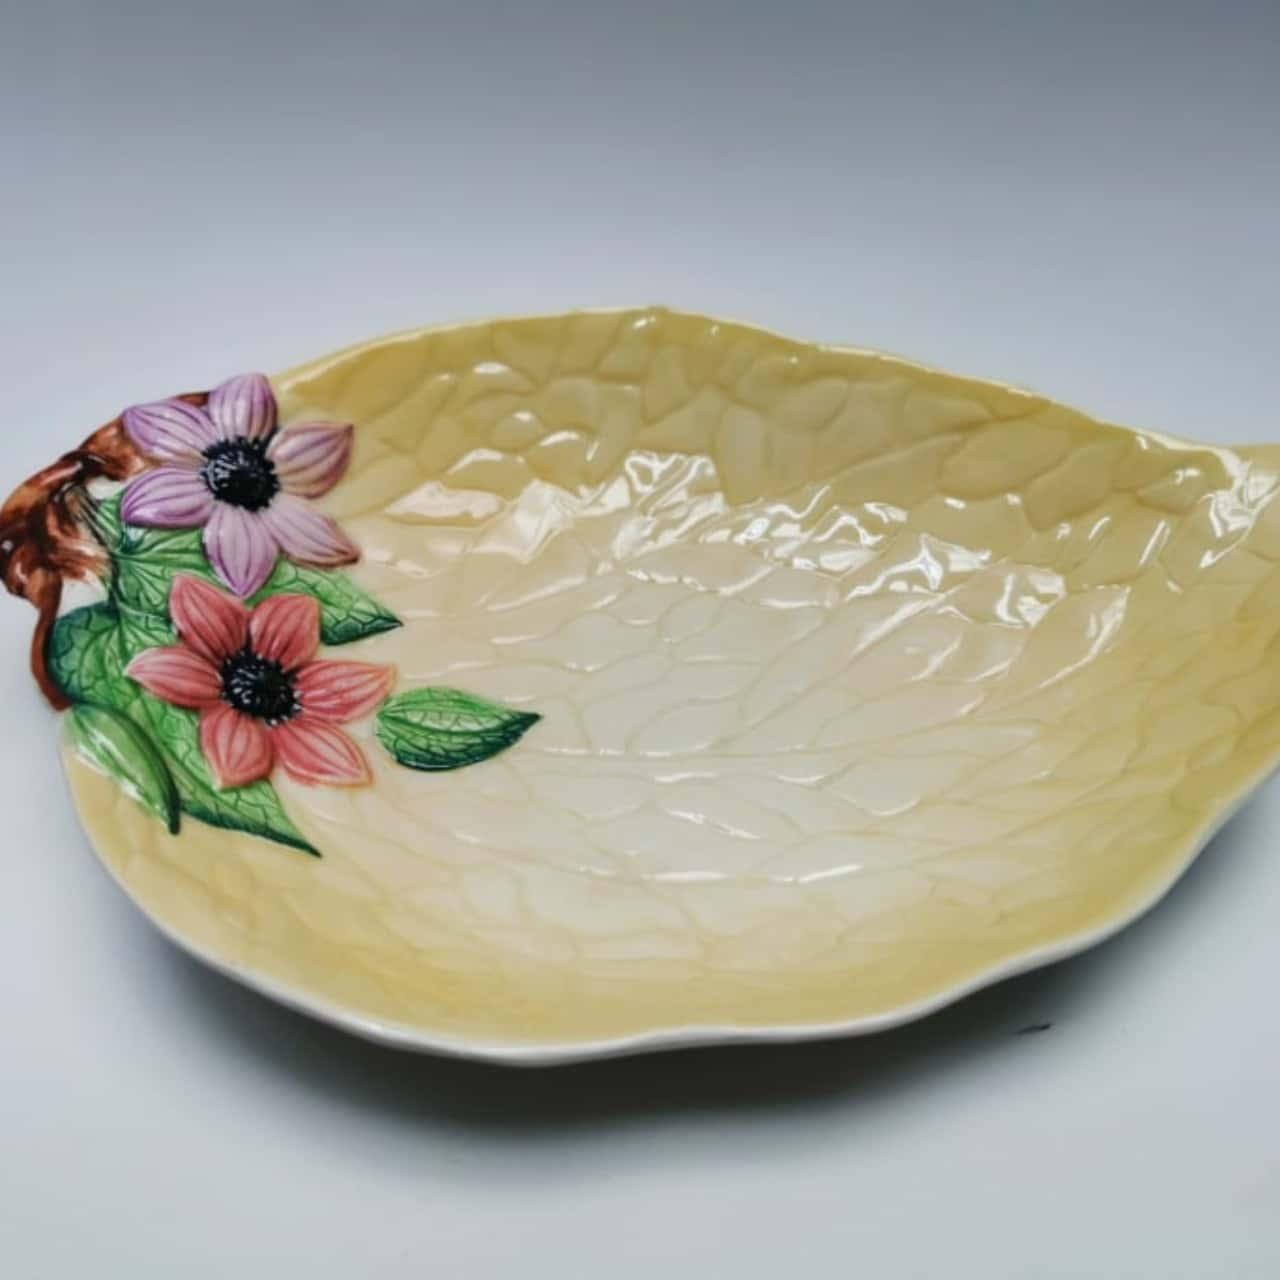 Carlton Ware Yellow Leaf Bowl